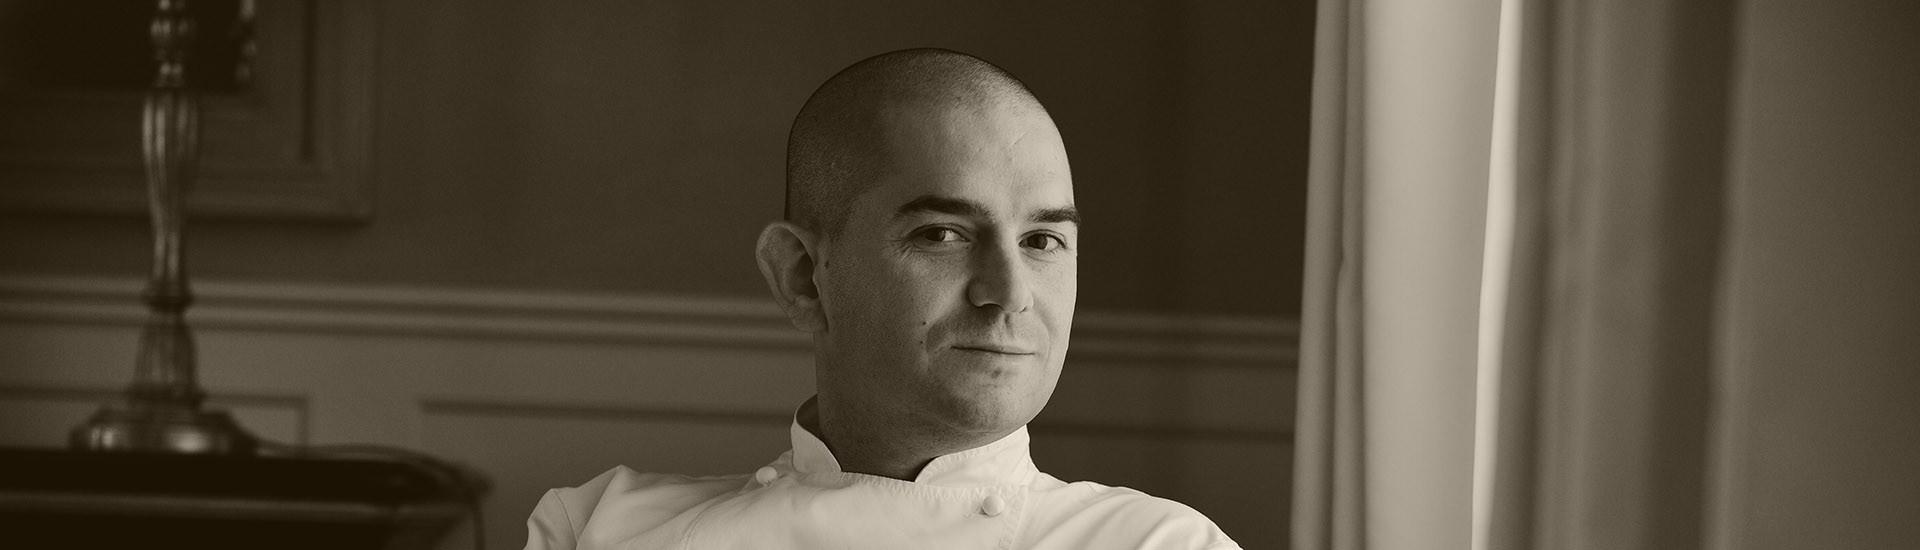 chef_evidenza